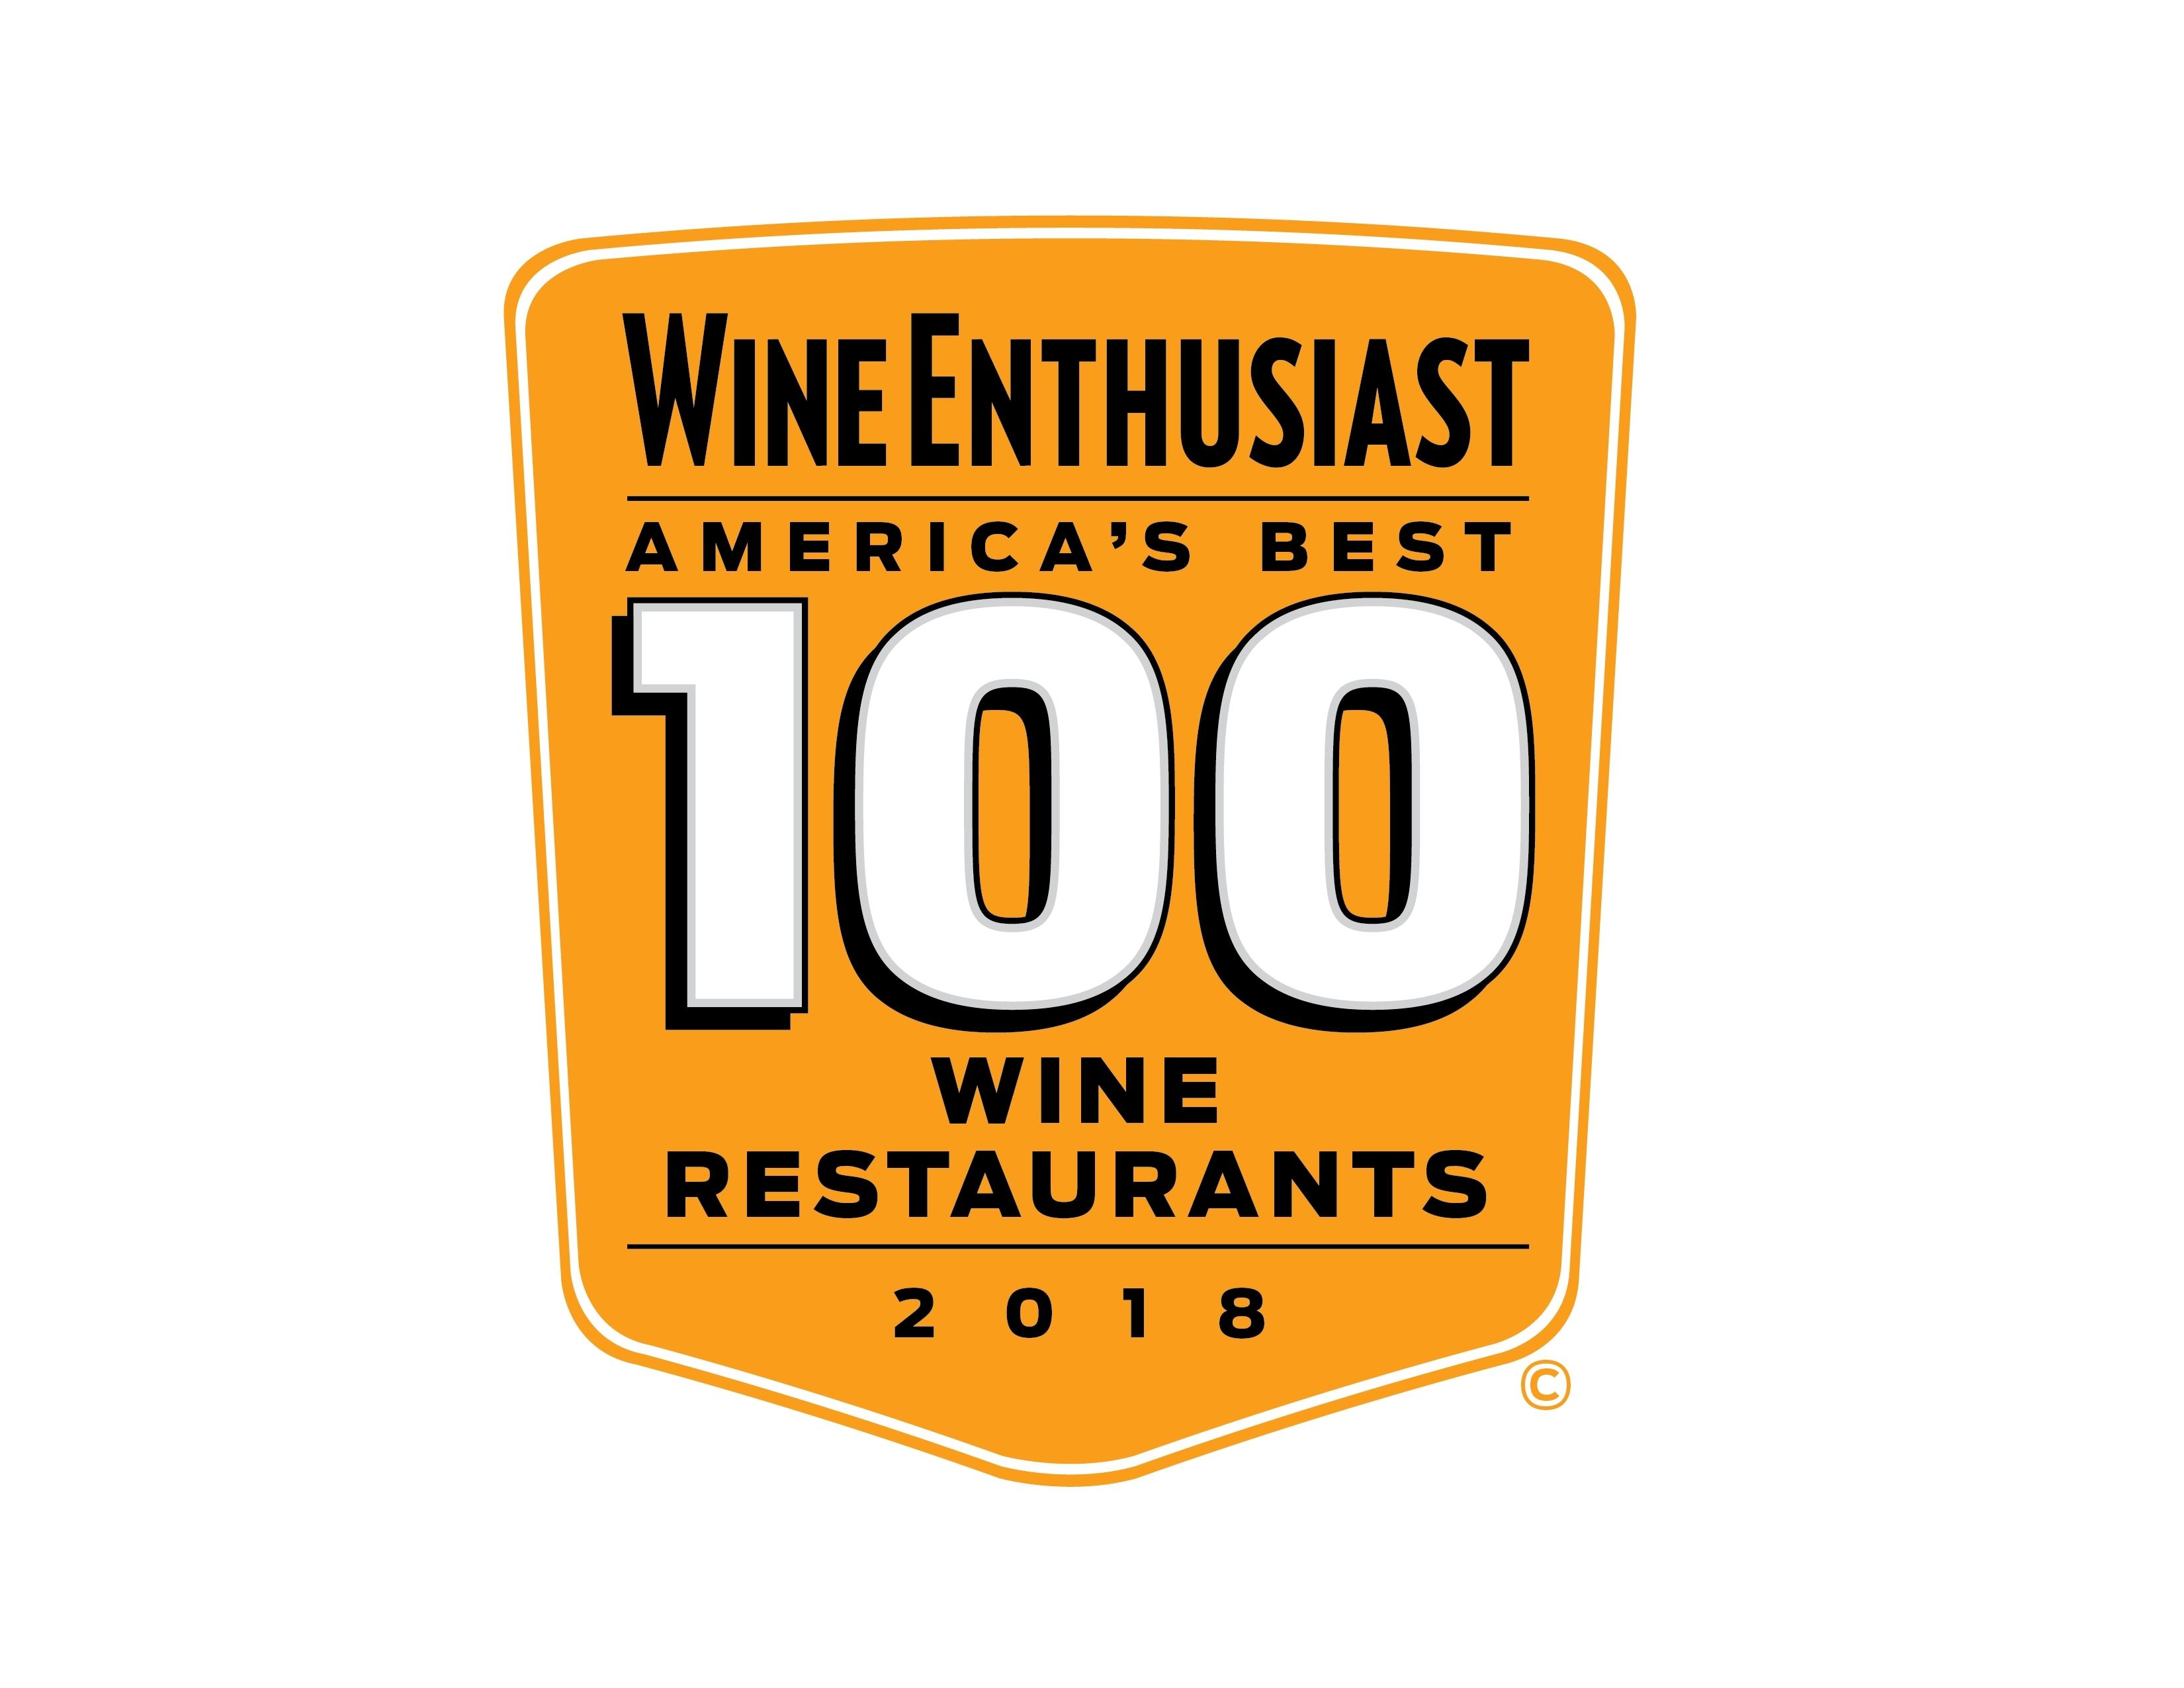 wine enthusiast magazine reveals america s 100 best wine restaurants